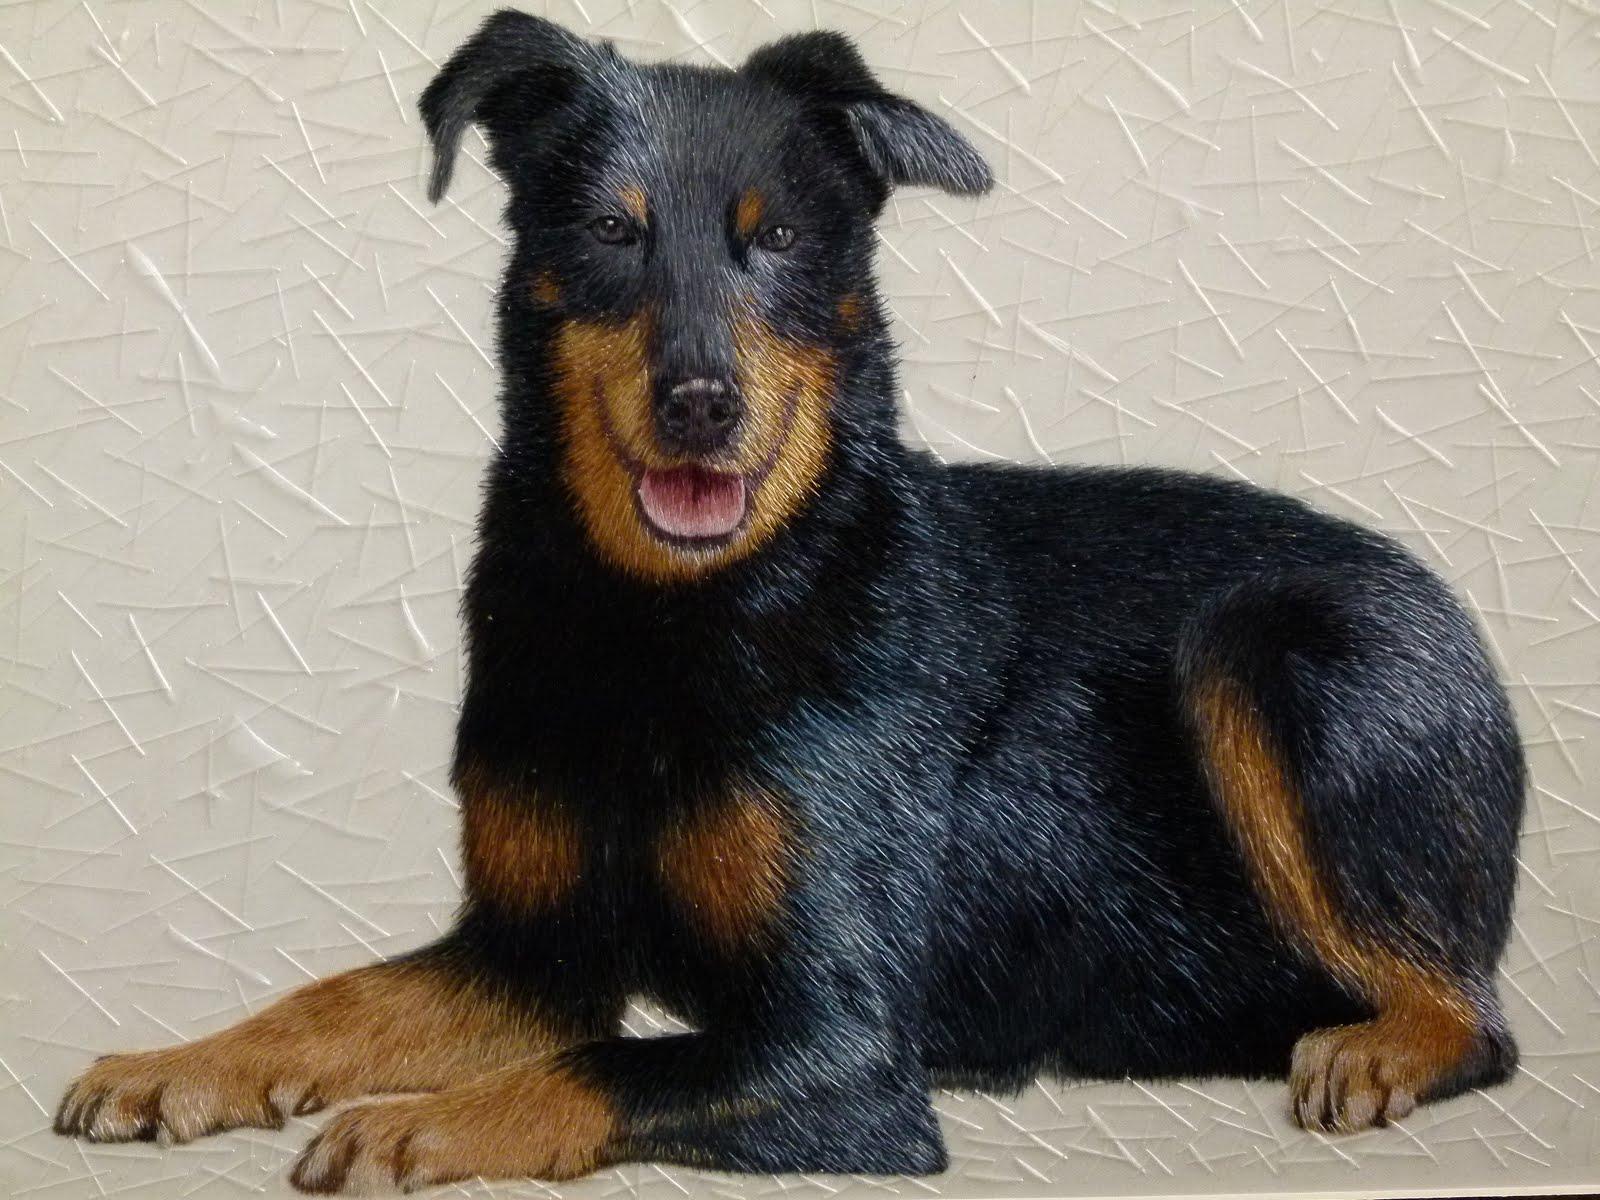 Doberman Pinscher Puppy Images Short Stitches Require a Lot